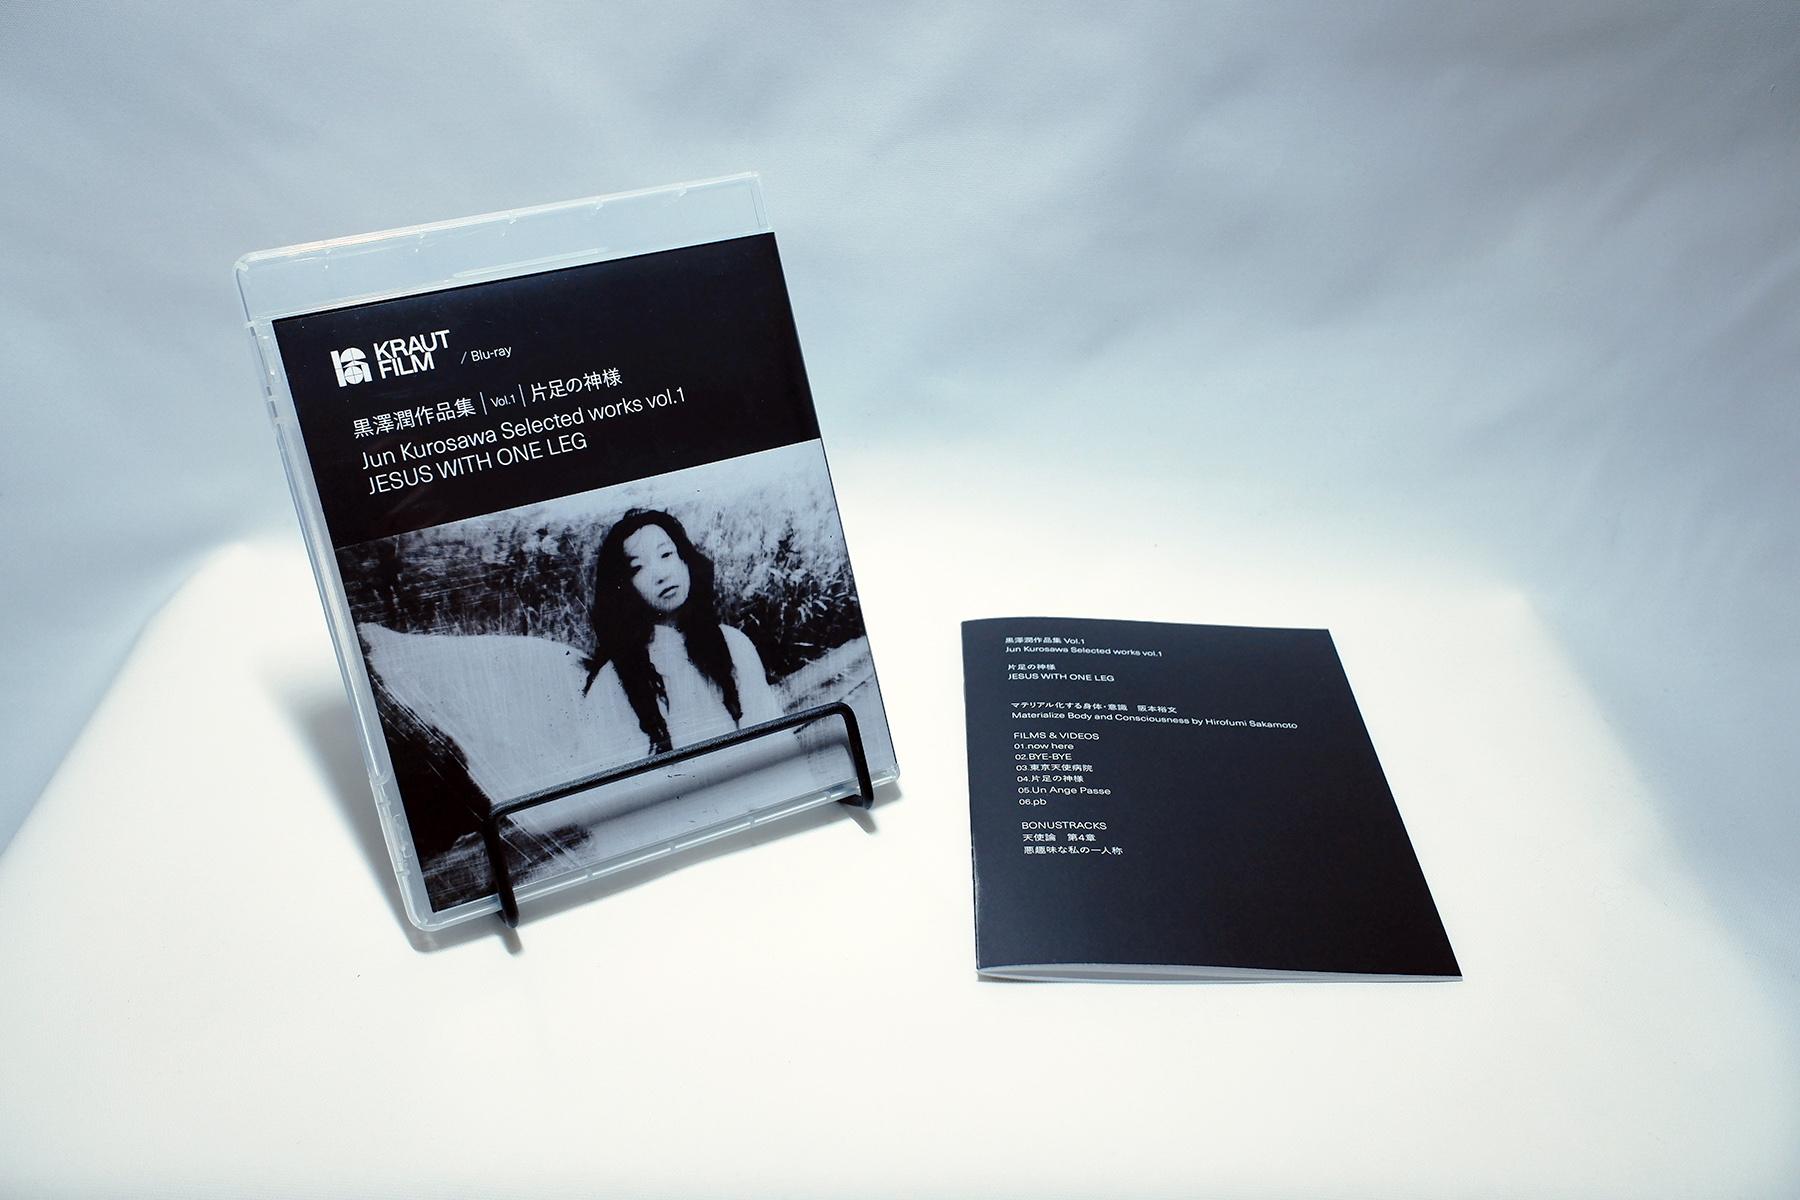 JUN KUROSAWA SELECTED WORKS VOL.1: JESUS WITH ONE LEG (KRAUT FILM)